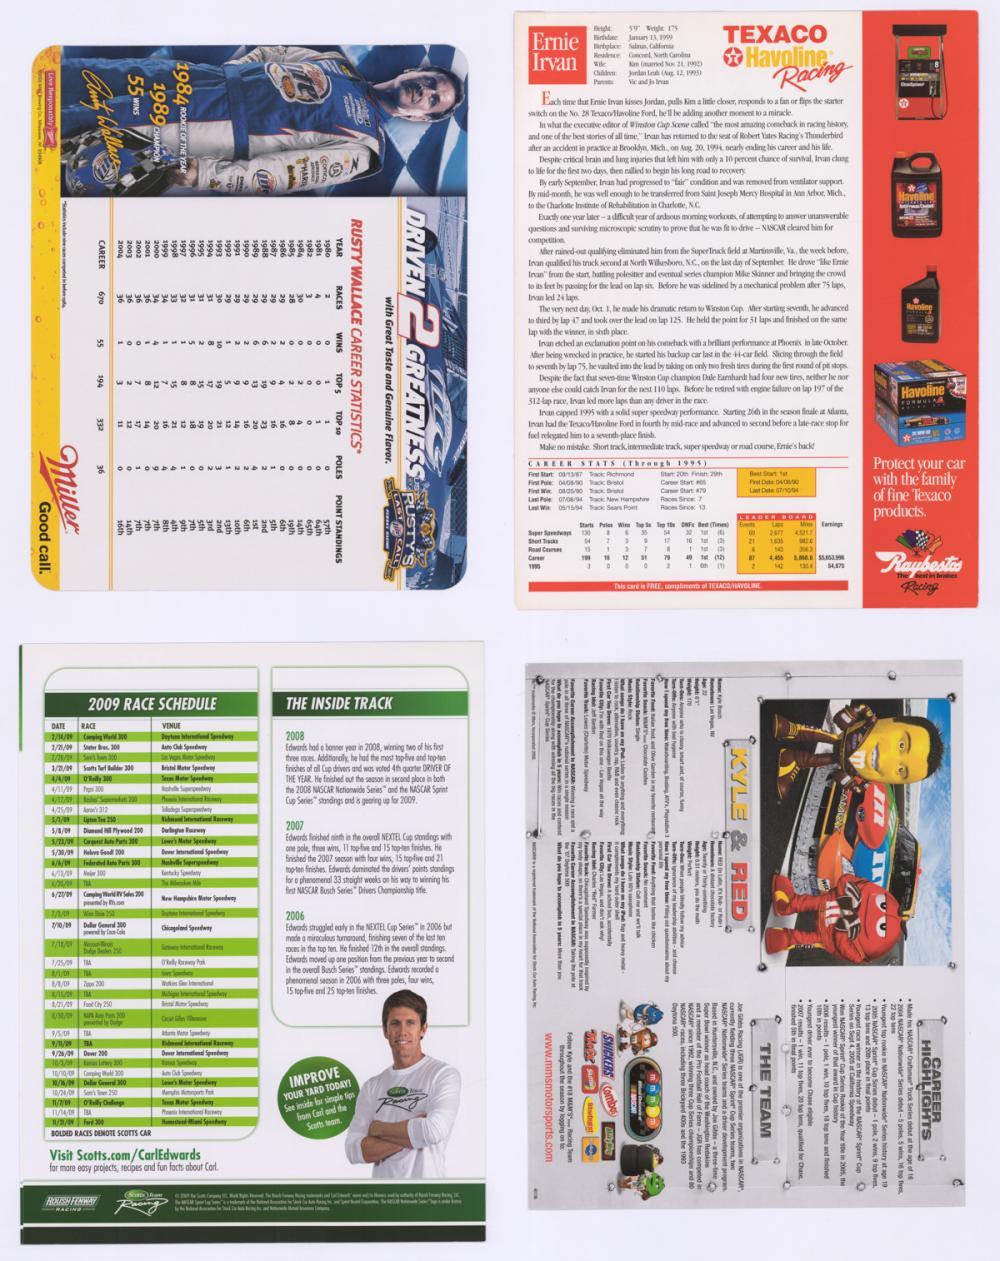 Lot 683: Nascar Drivers Signed Photos (4) Beckett COA's